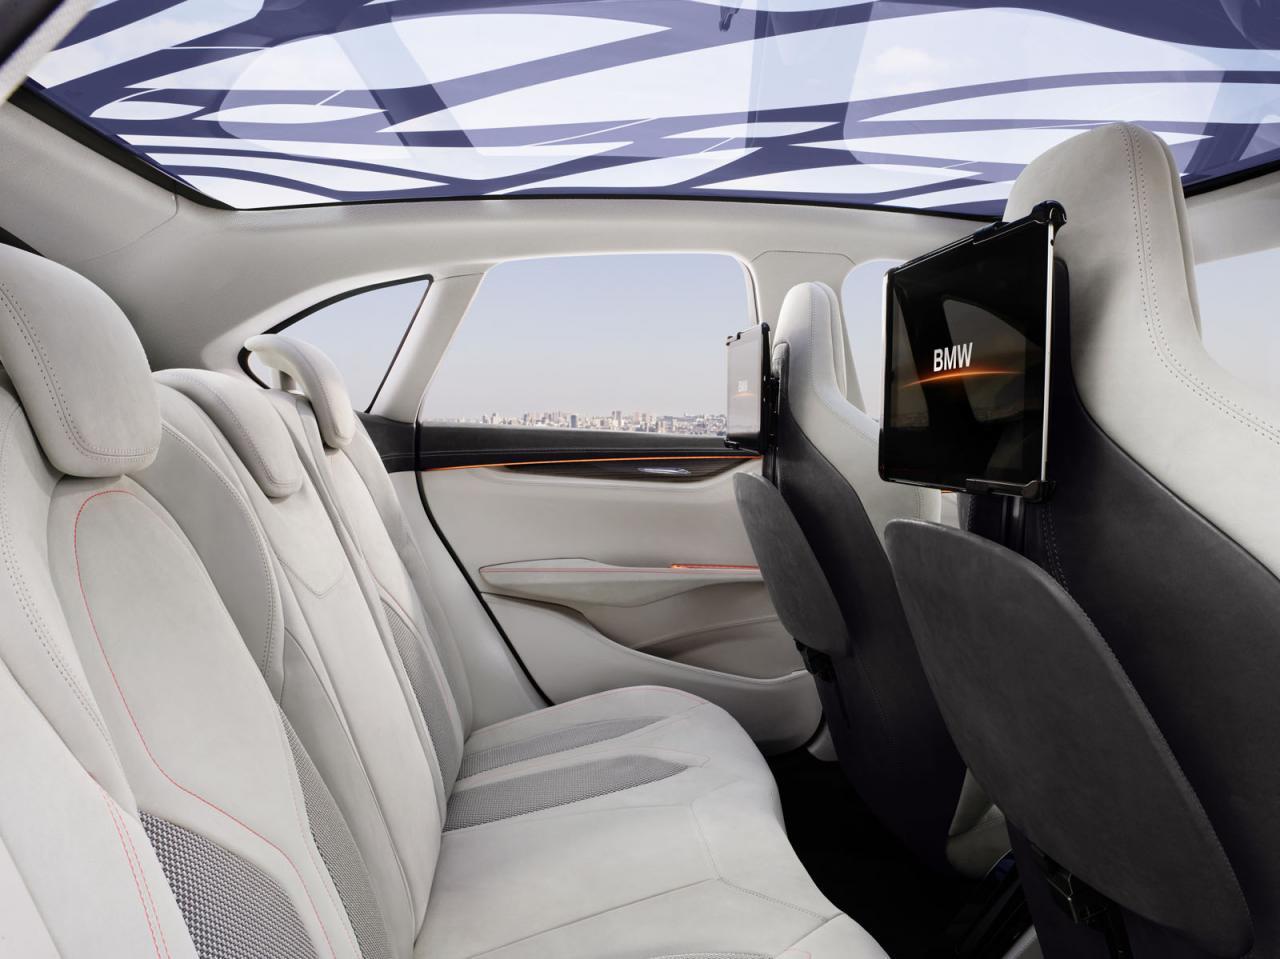 BMW+Concept+Active+Tourer+4.jpg